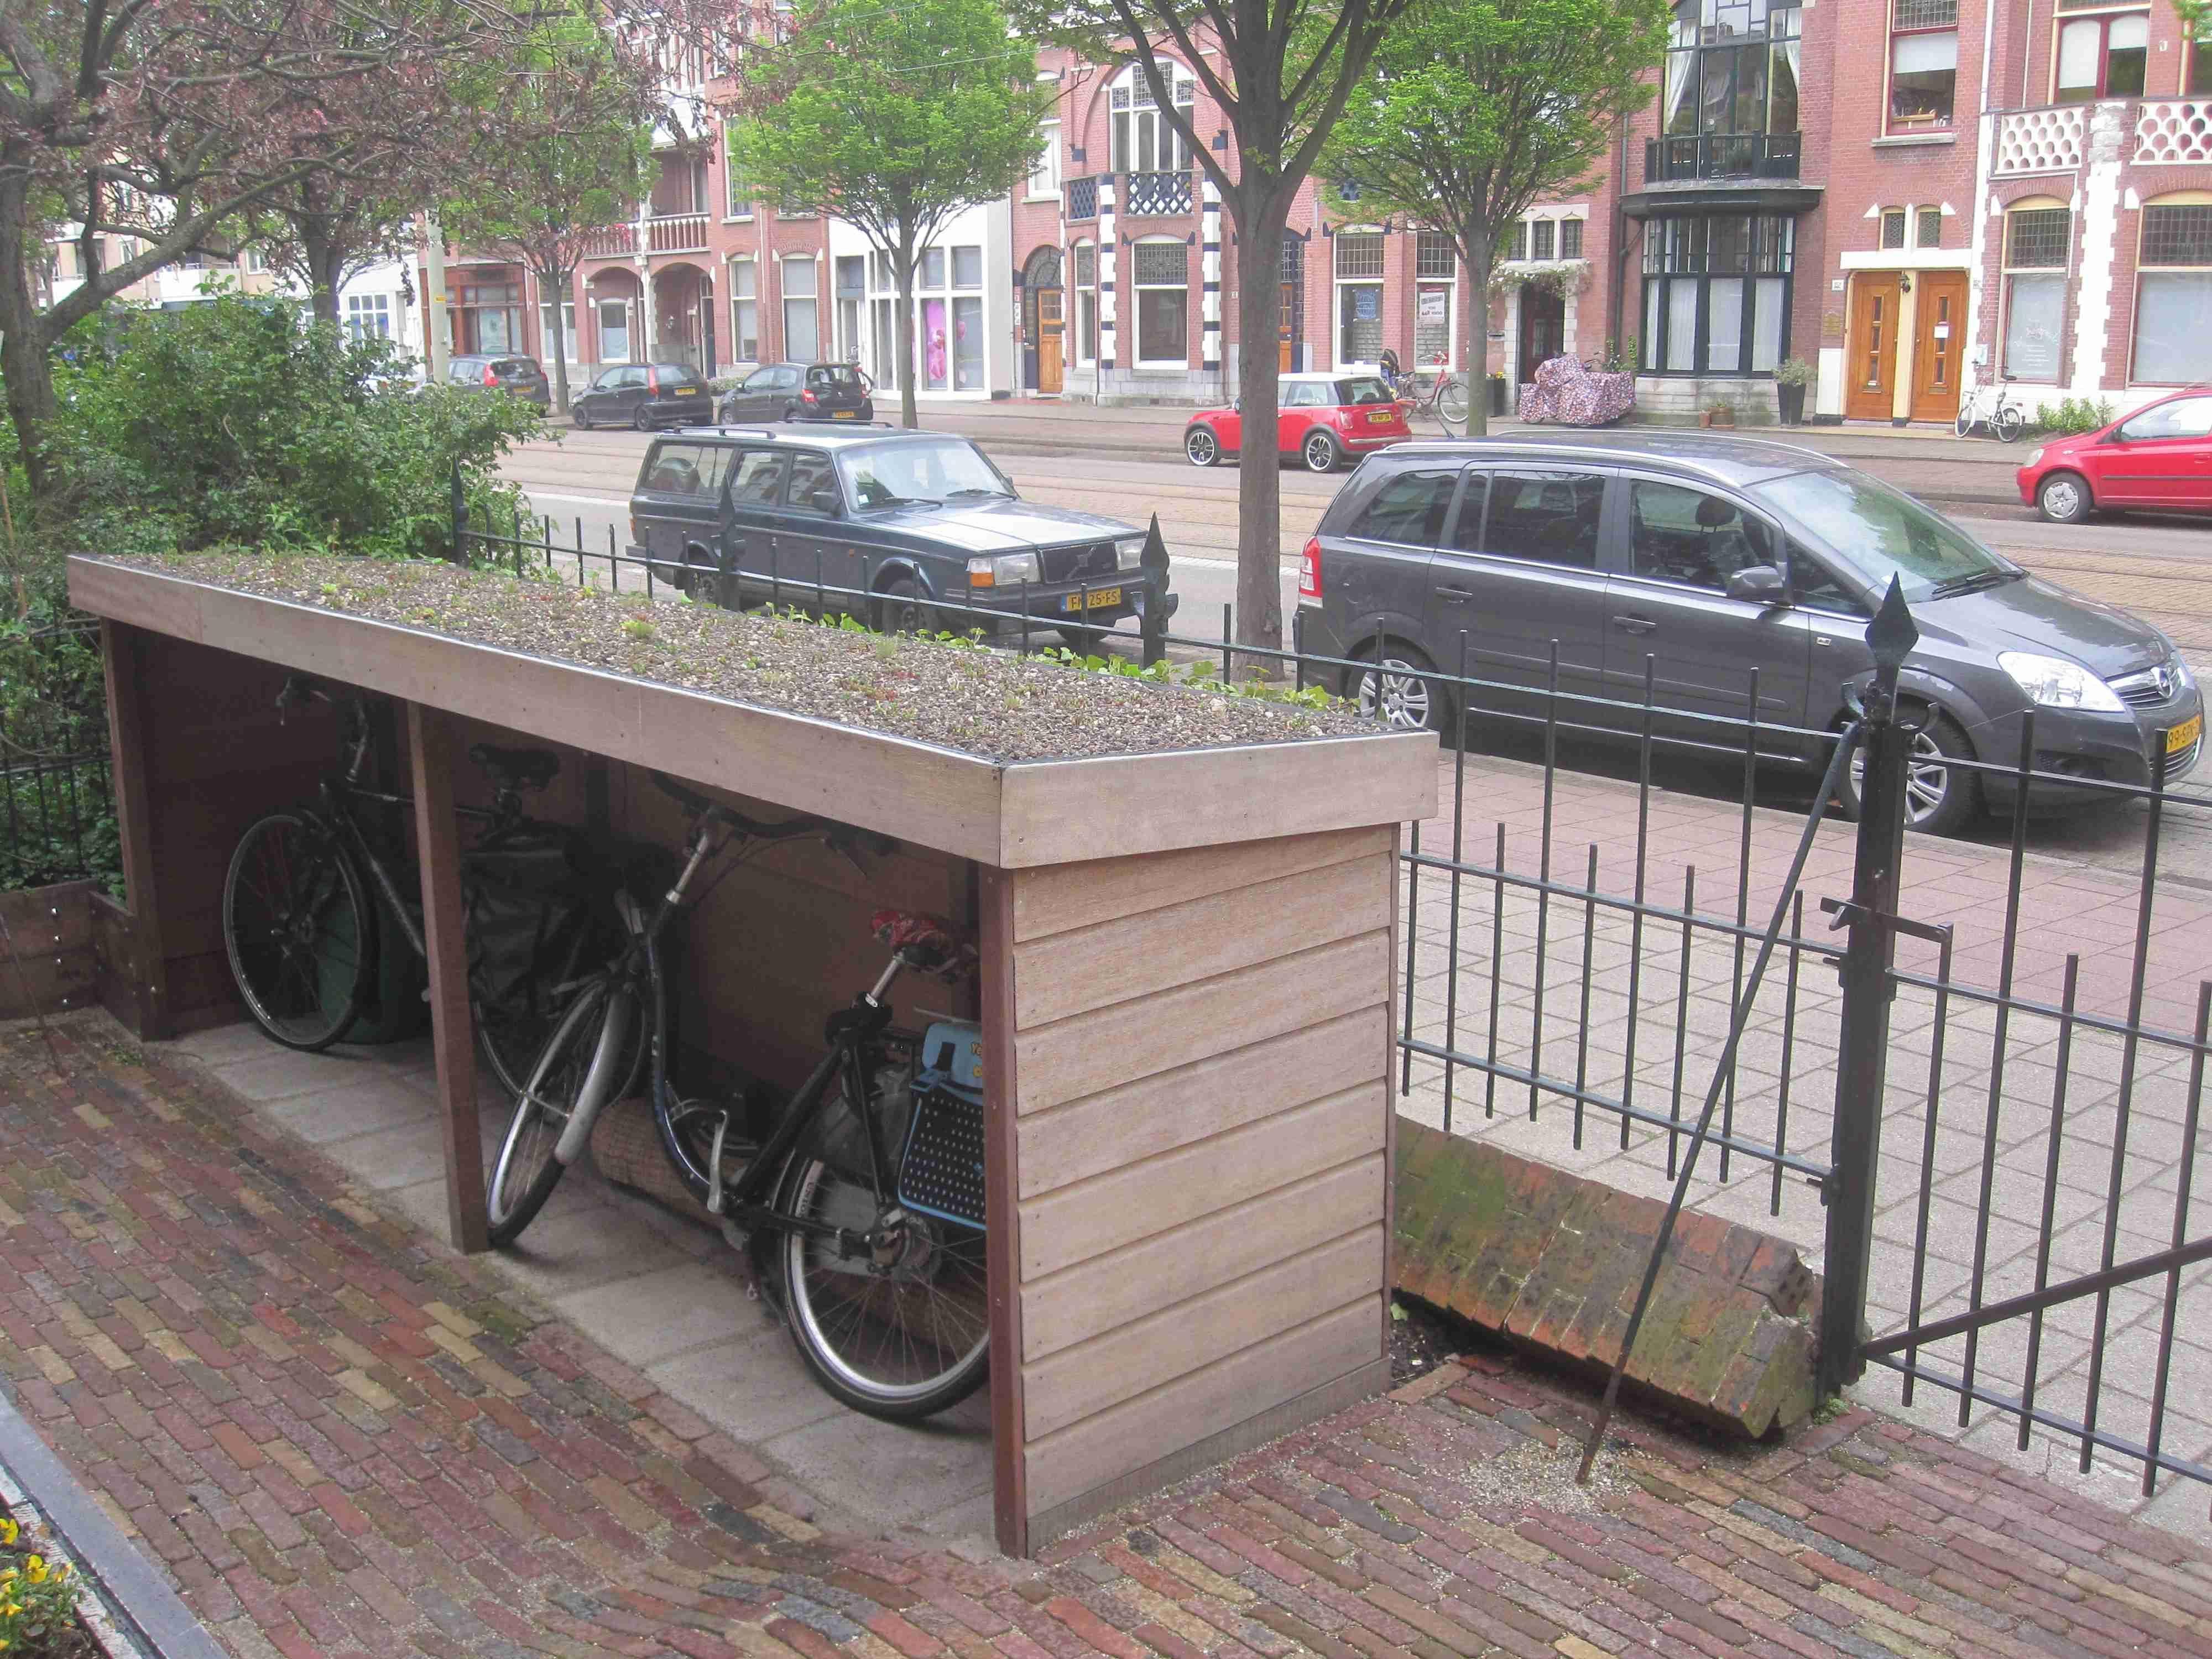 Bike Sheds Plans For Home Bike Shed Plans Free Plans